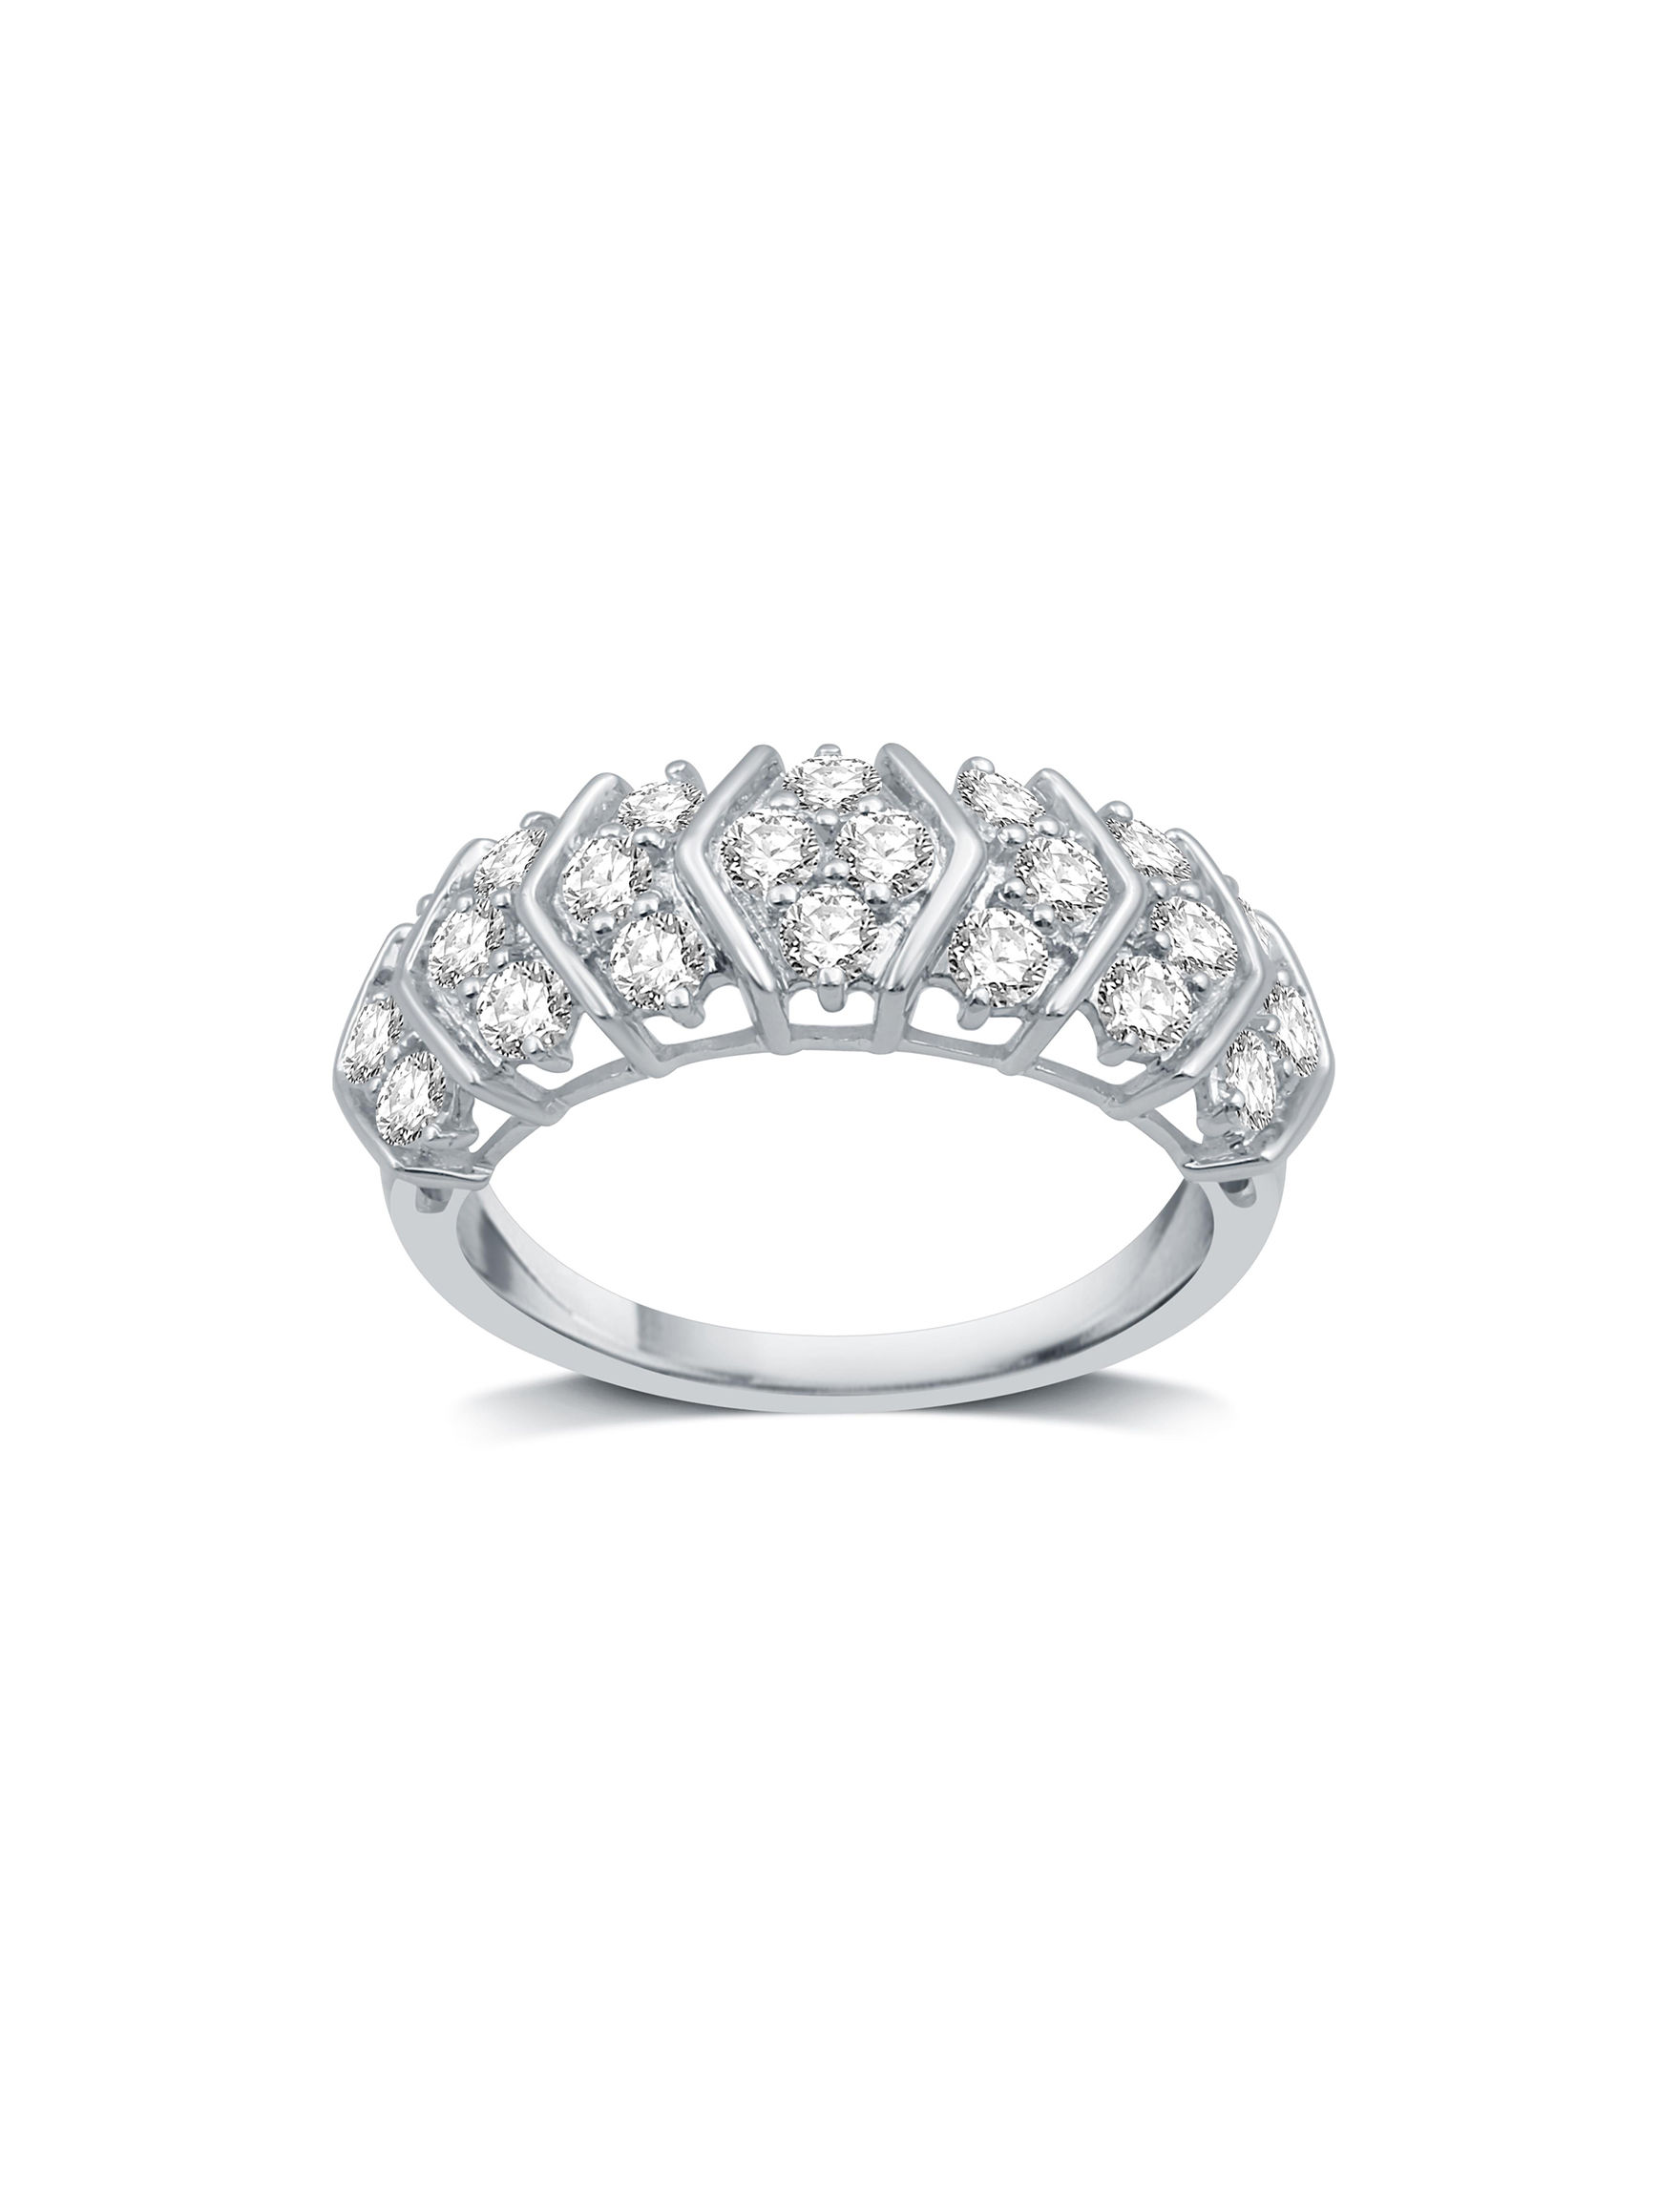 Allure White Gold Rings Fine Jewelry